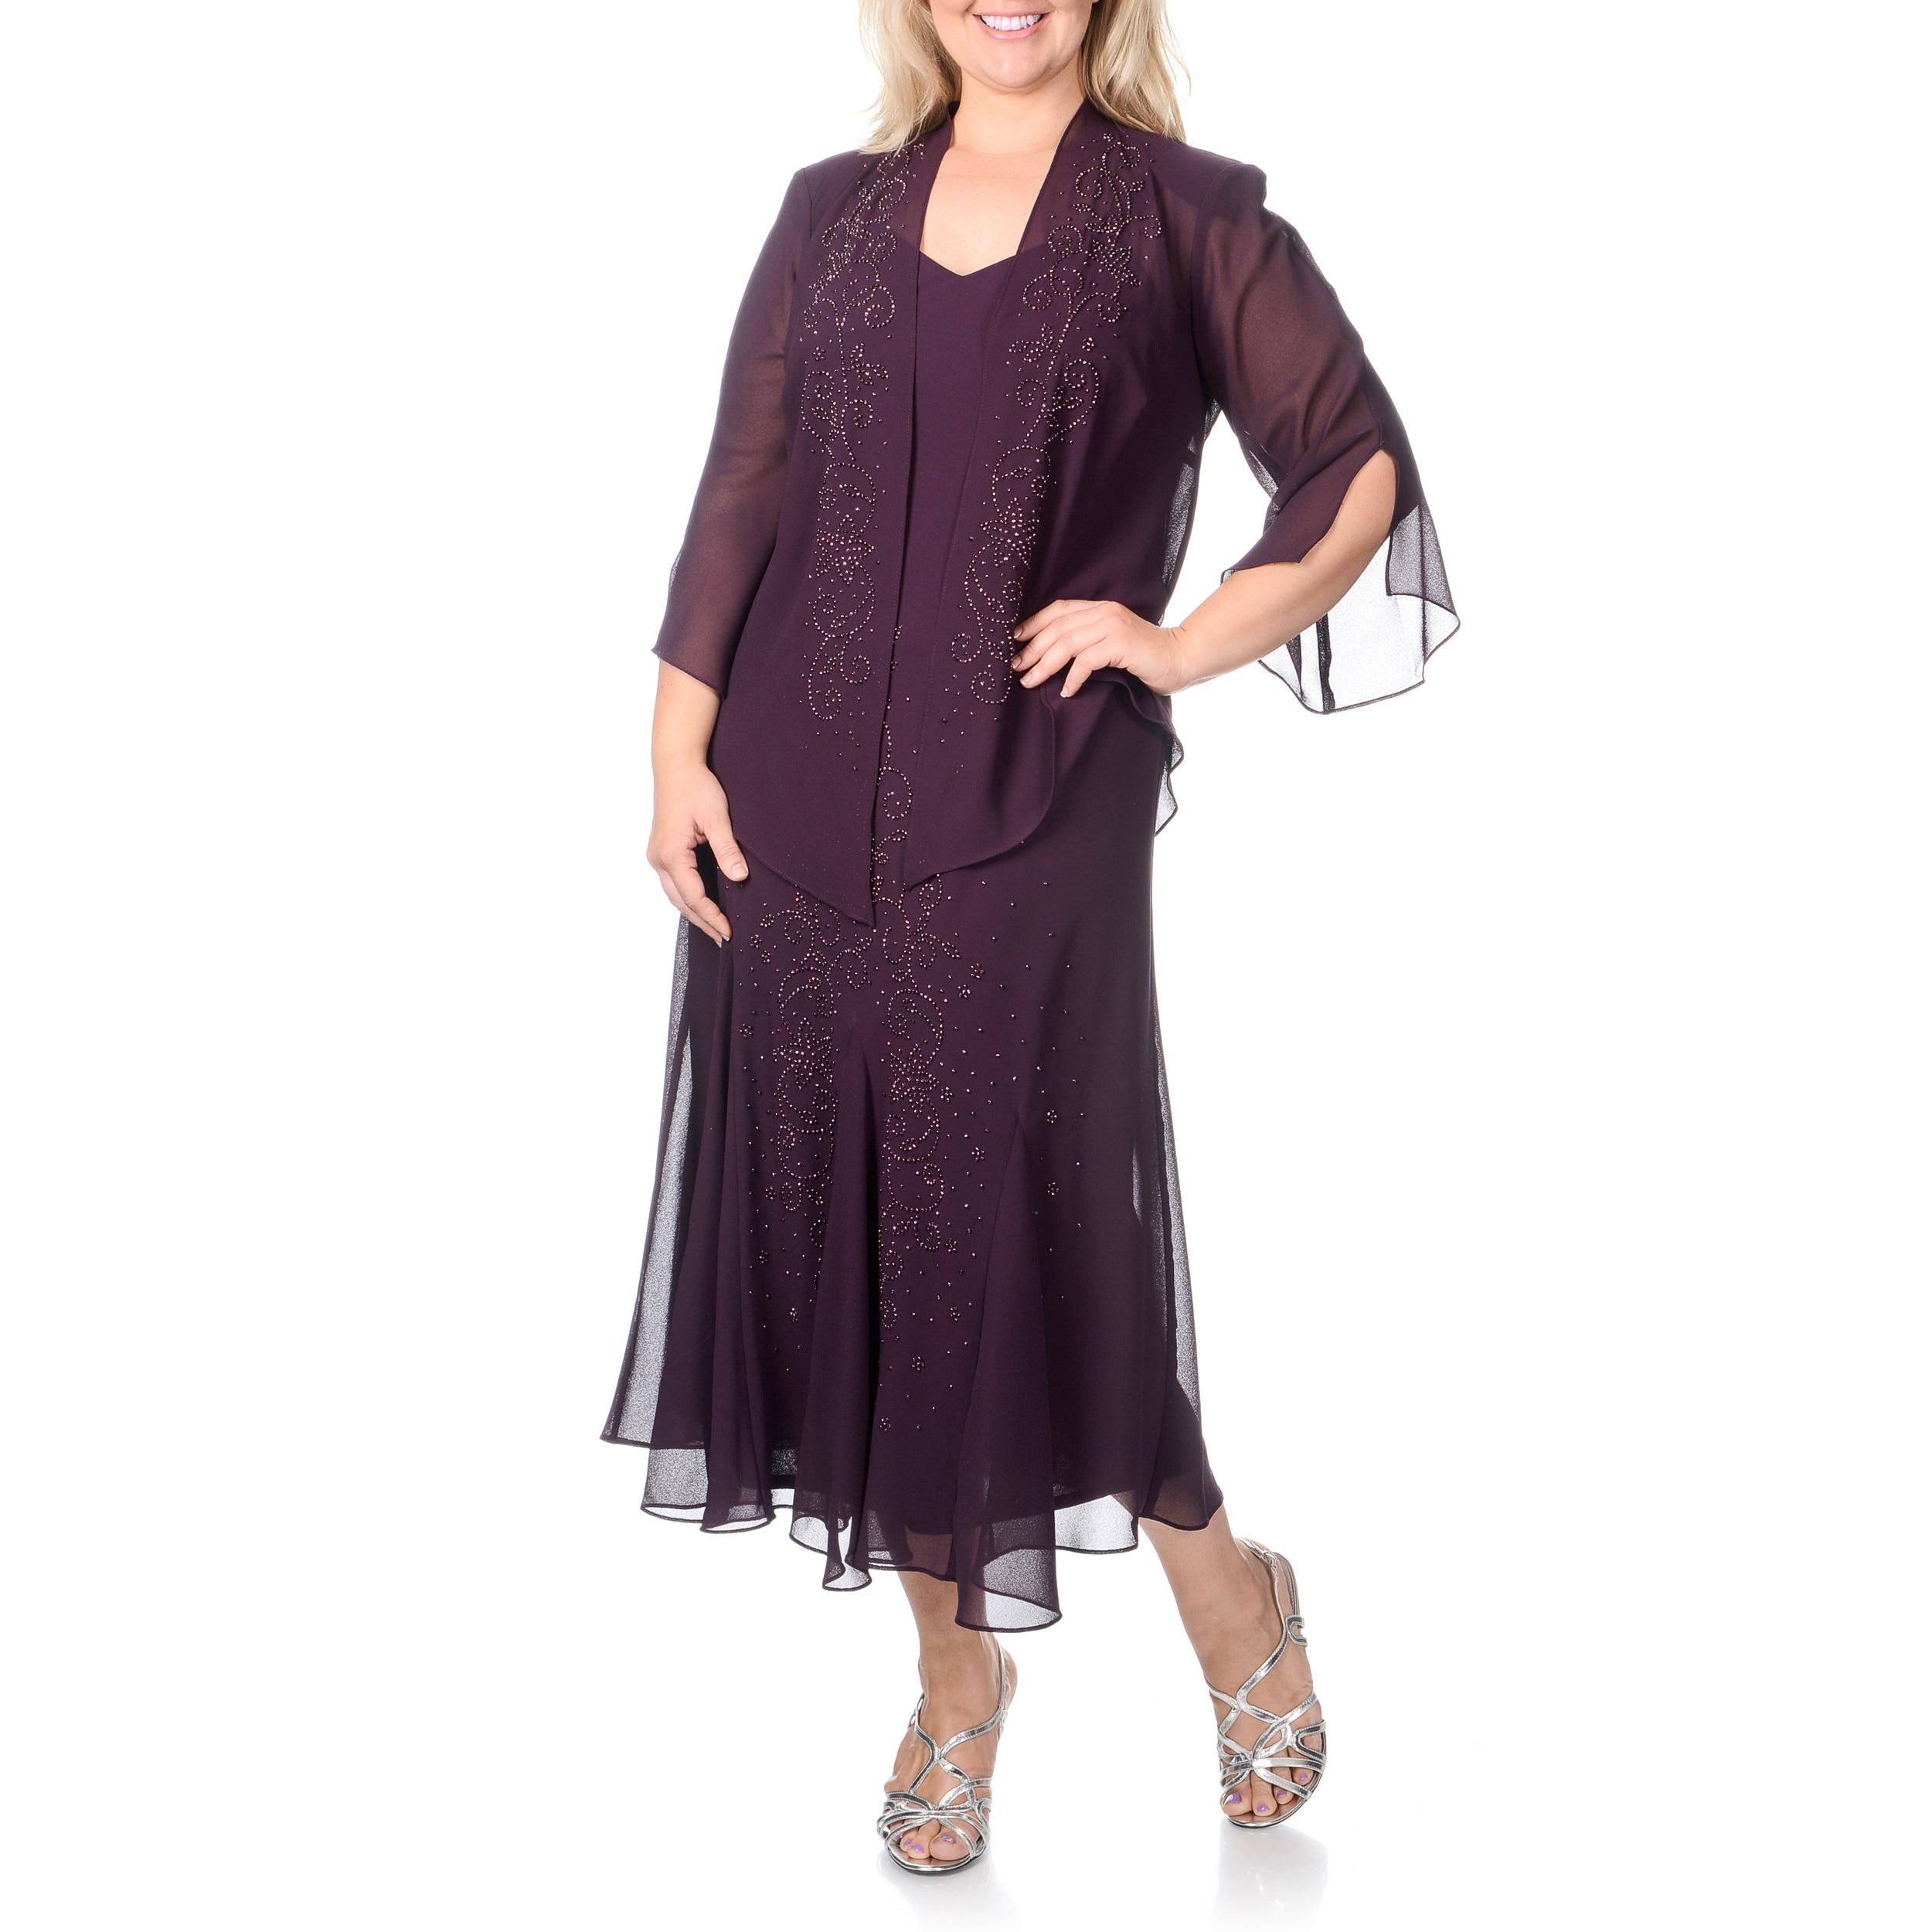 R&M Richards Women\'s Plus Size Caviar Beaded Detail 2-piece Dress